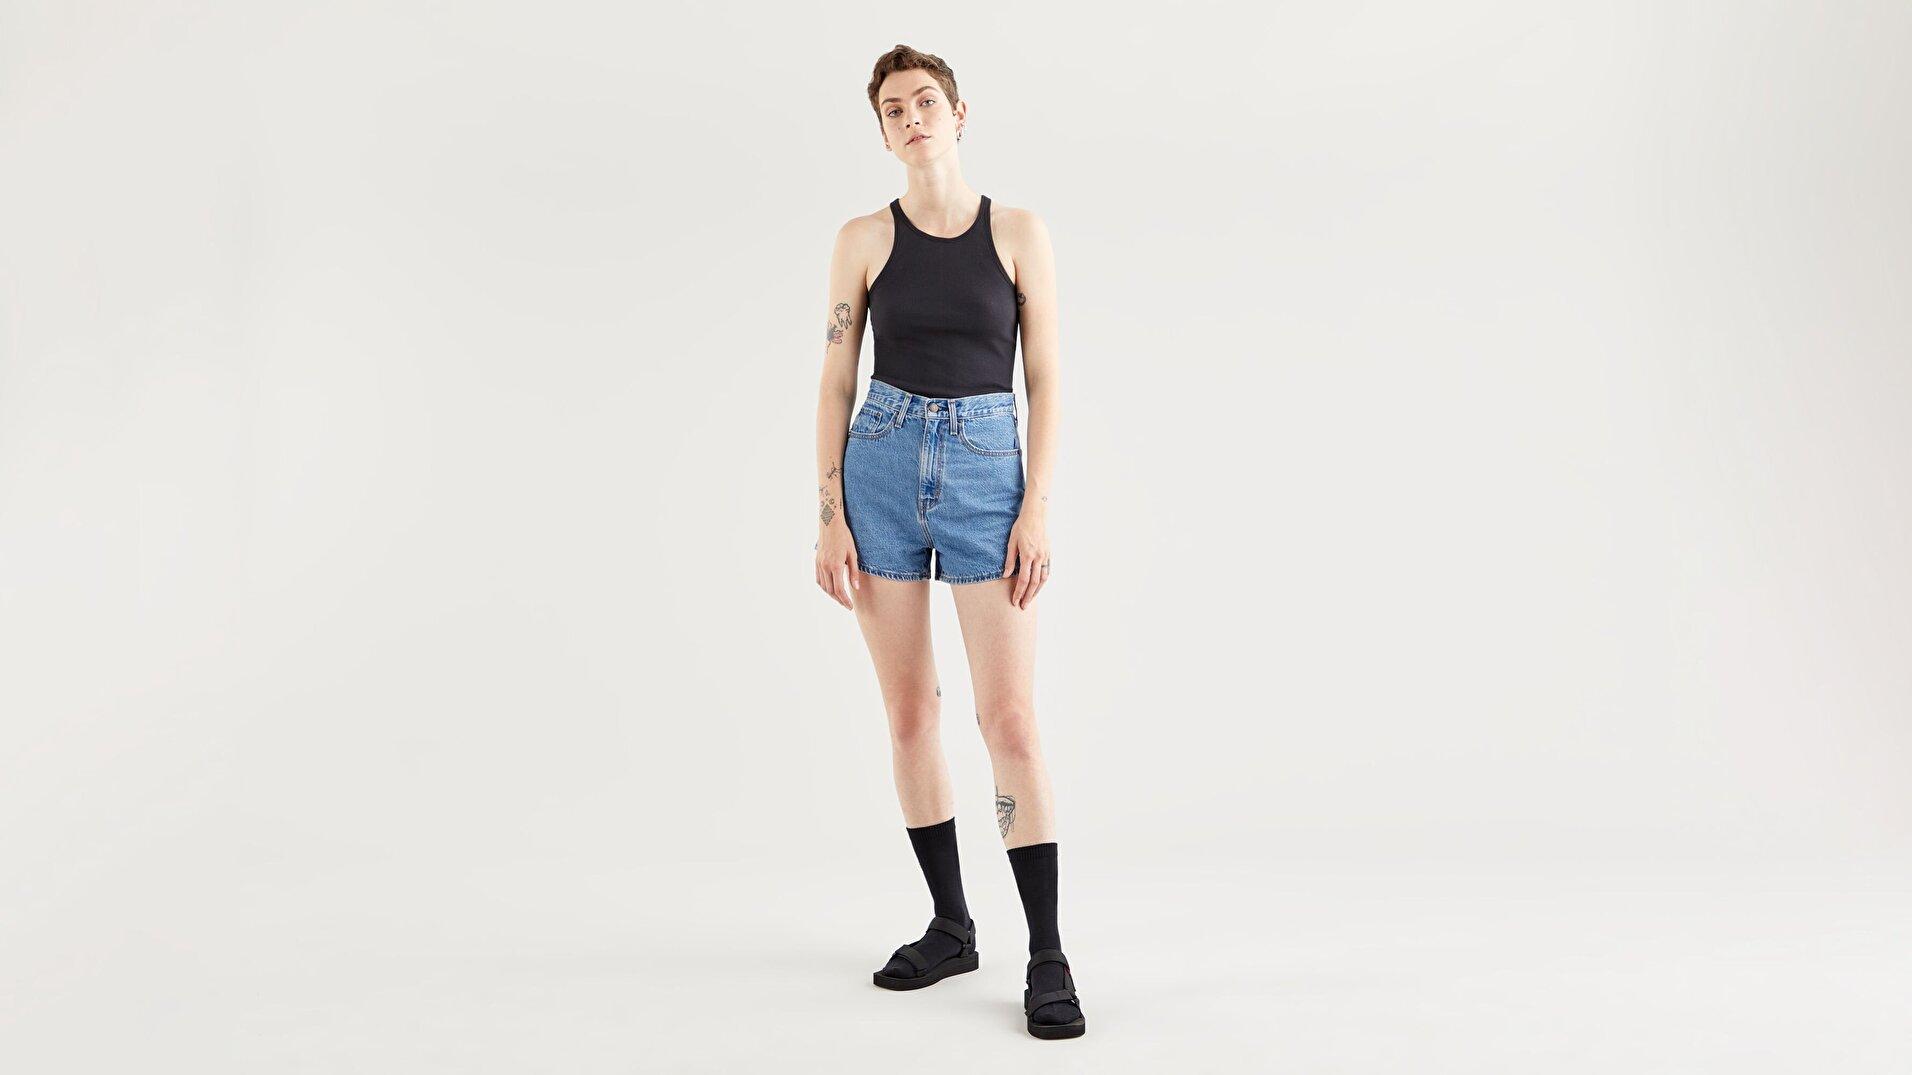 High Neck Tank Caviar Siyah  Kadın Tişört